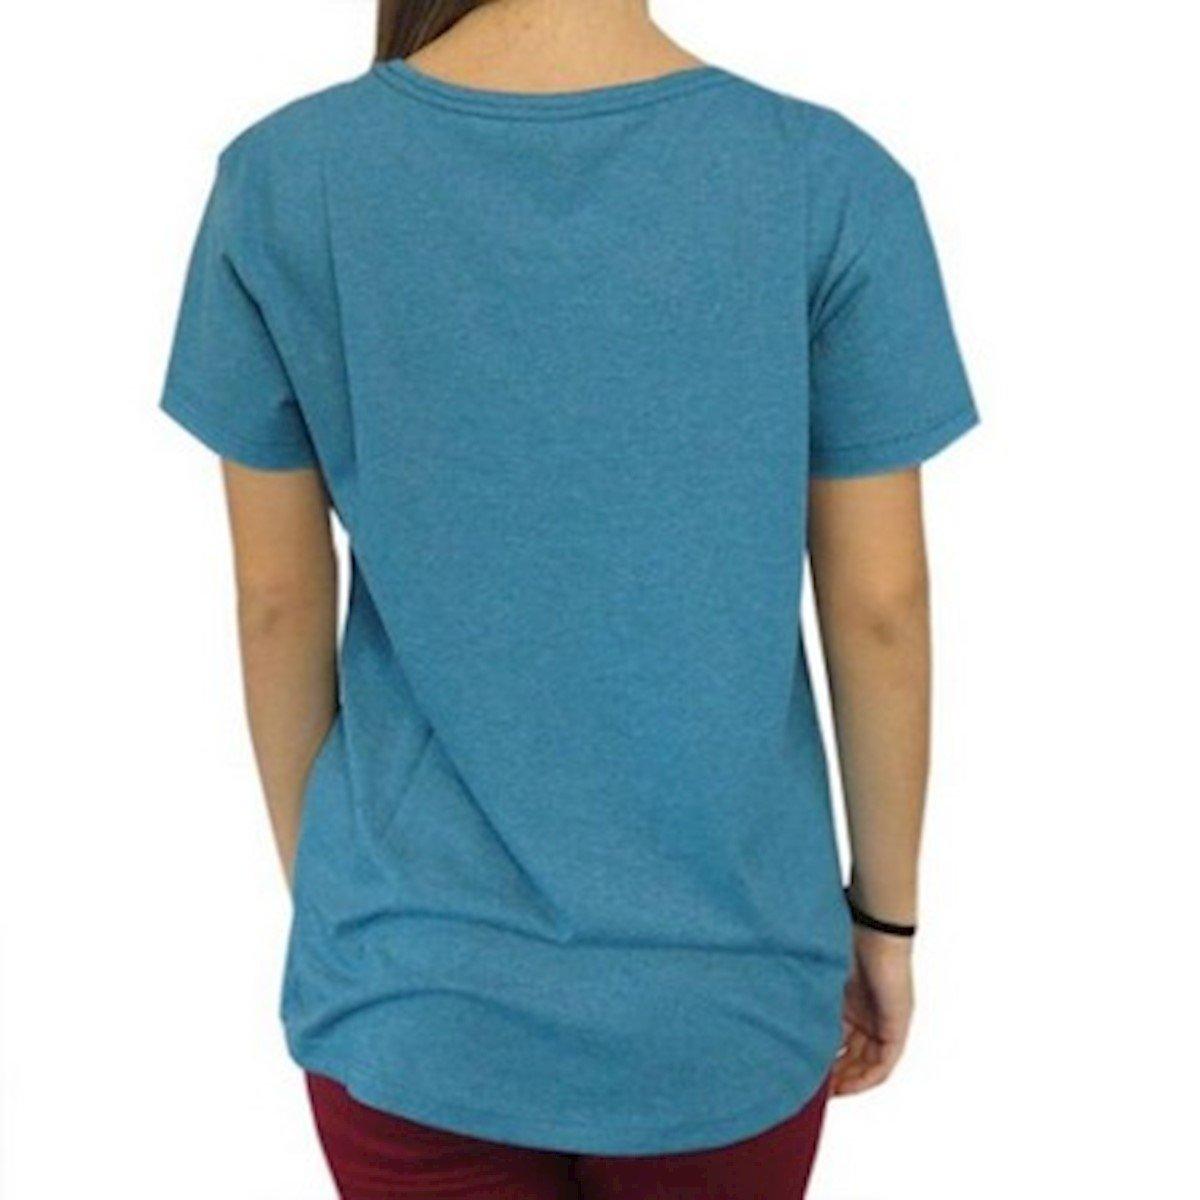 Camiseta Nico Hurley Feminina  Camiseta Nico Hurley Feminina daf38f6d92889